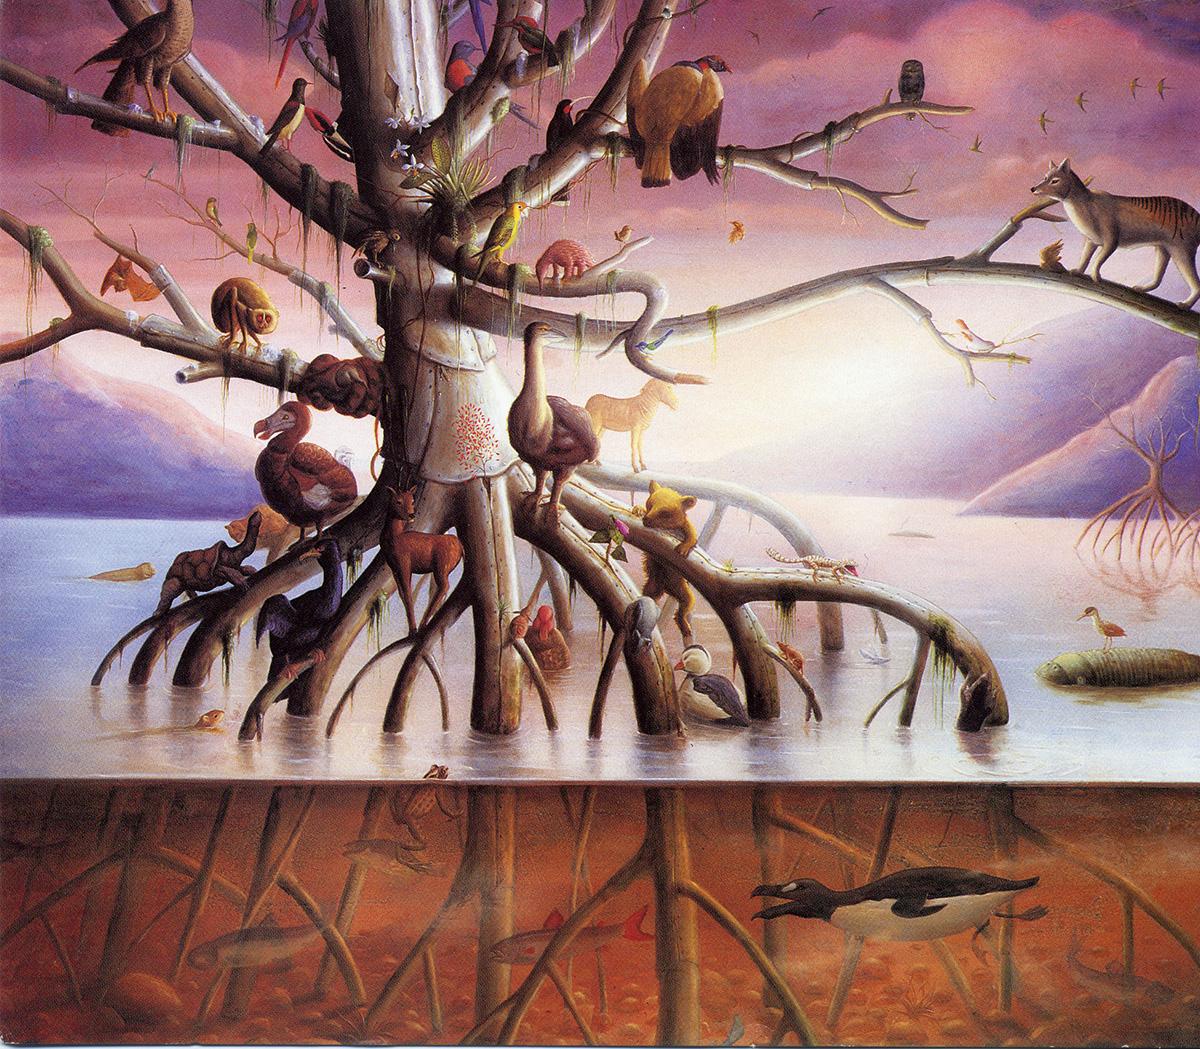 Tree full of extinct animals